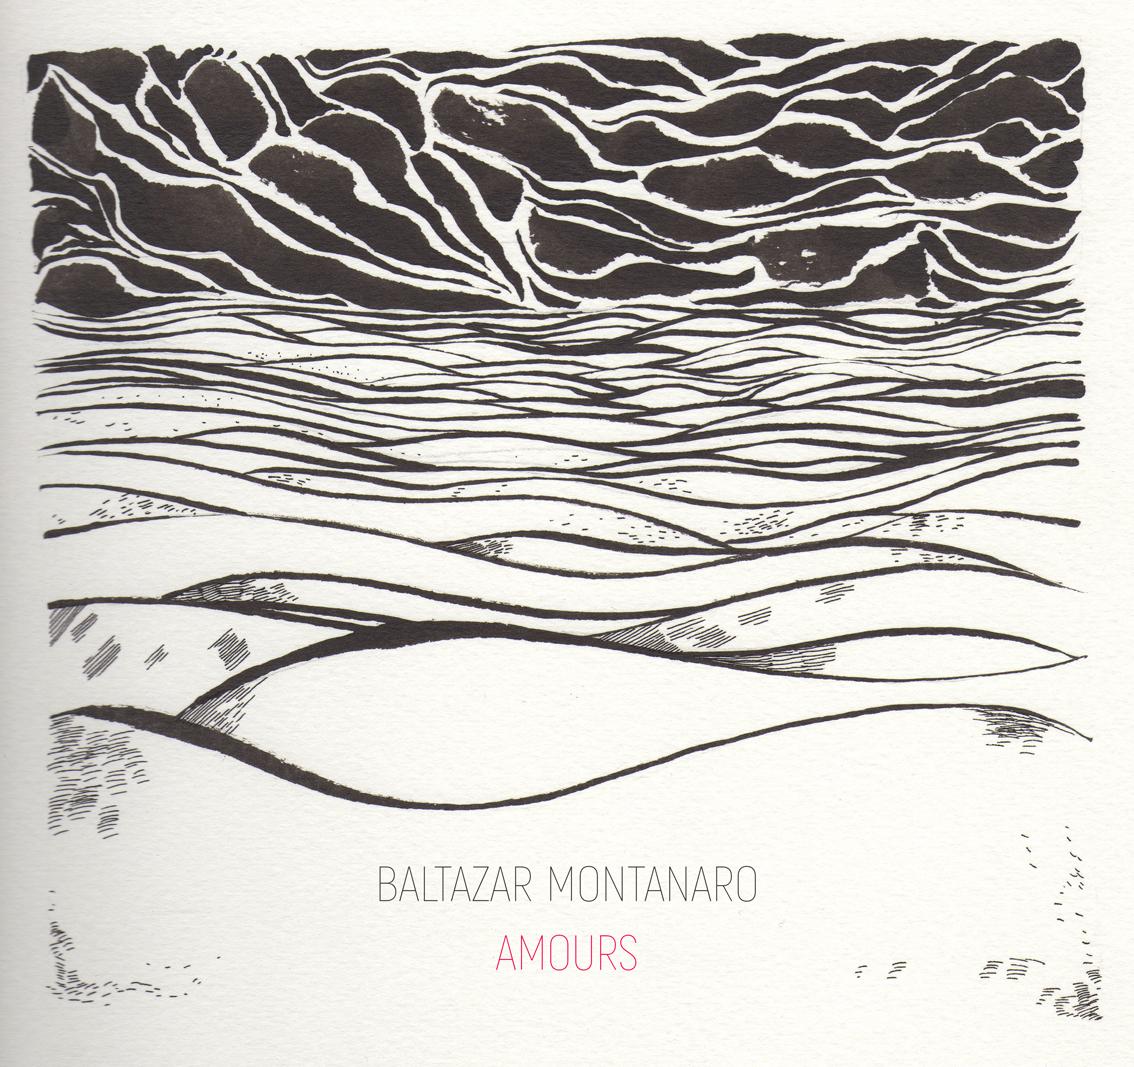 Amours - Baltazar Montanaro